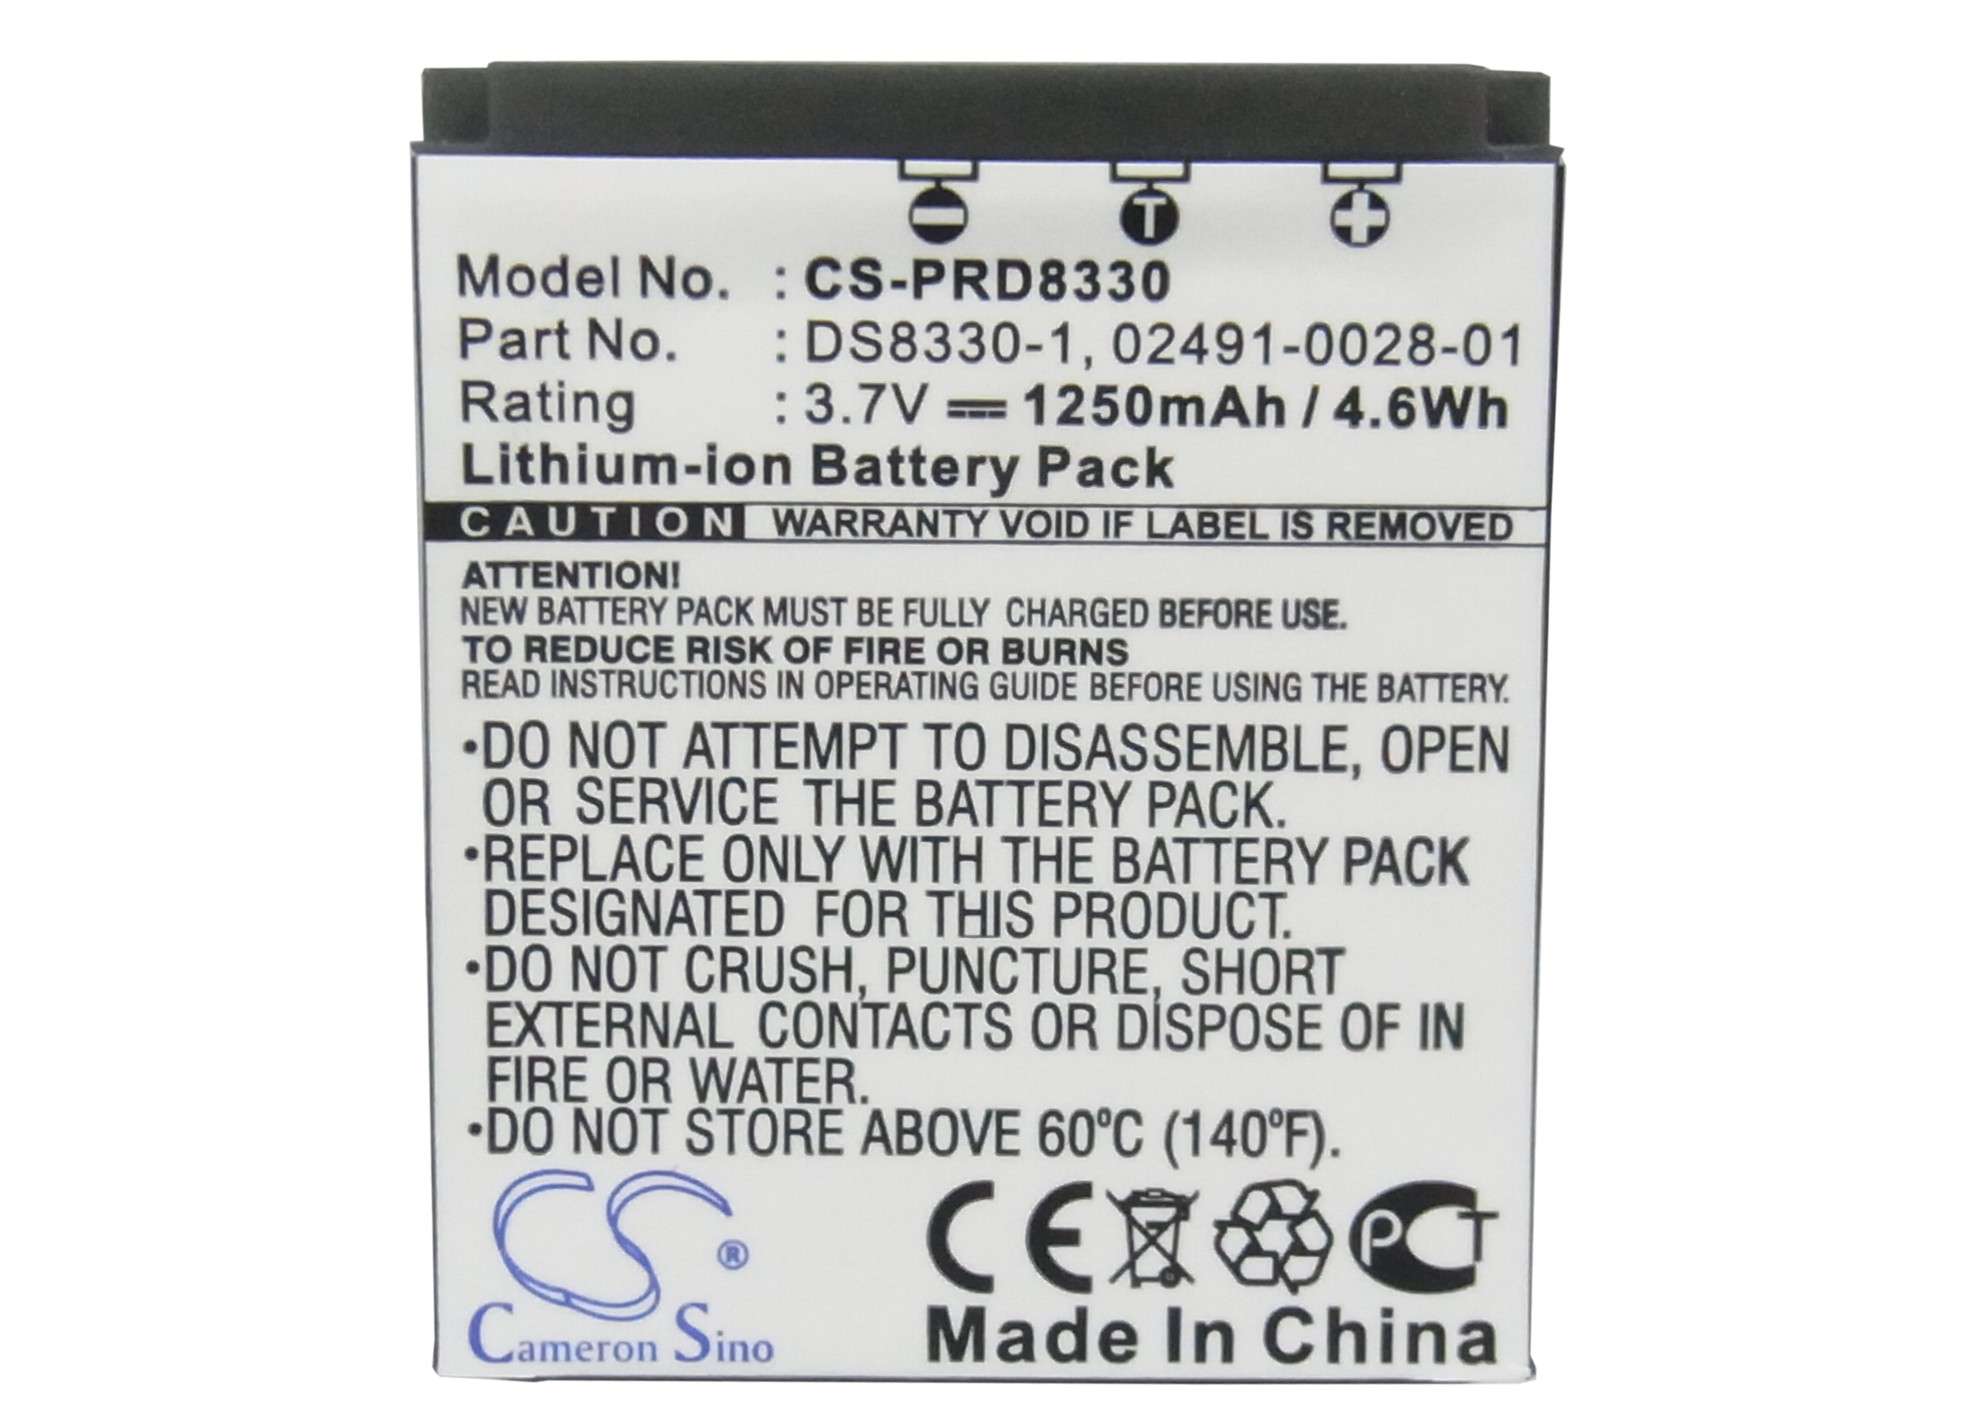 Cameron sino 1250 mah bateria para rollei compactline 150, prego 8330, prego dp8300, prego dp8330, RCP-7430XW, RCP-8427XW, RCP-8527X